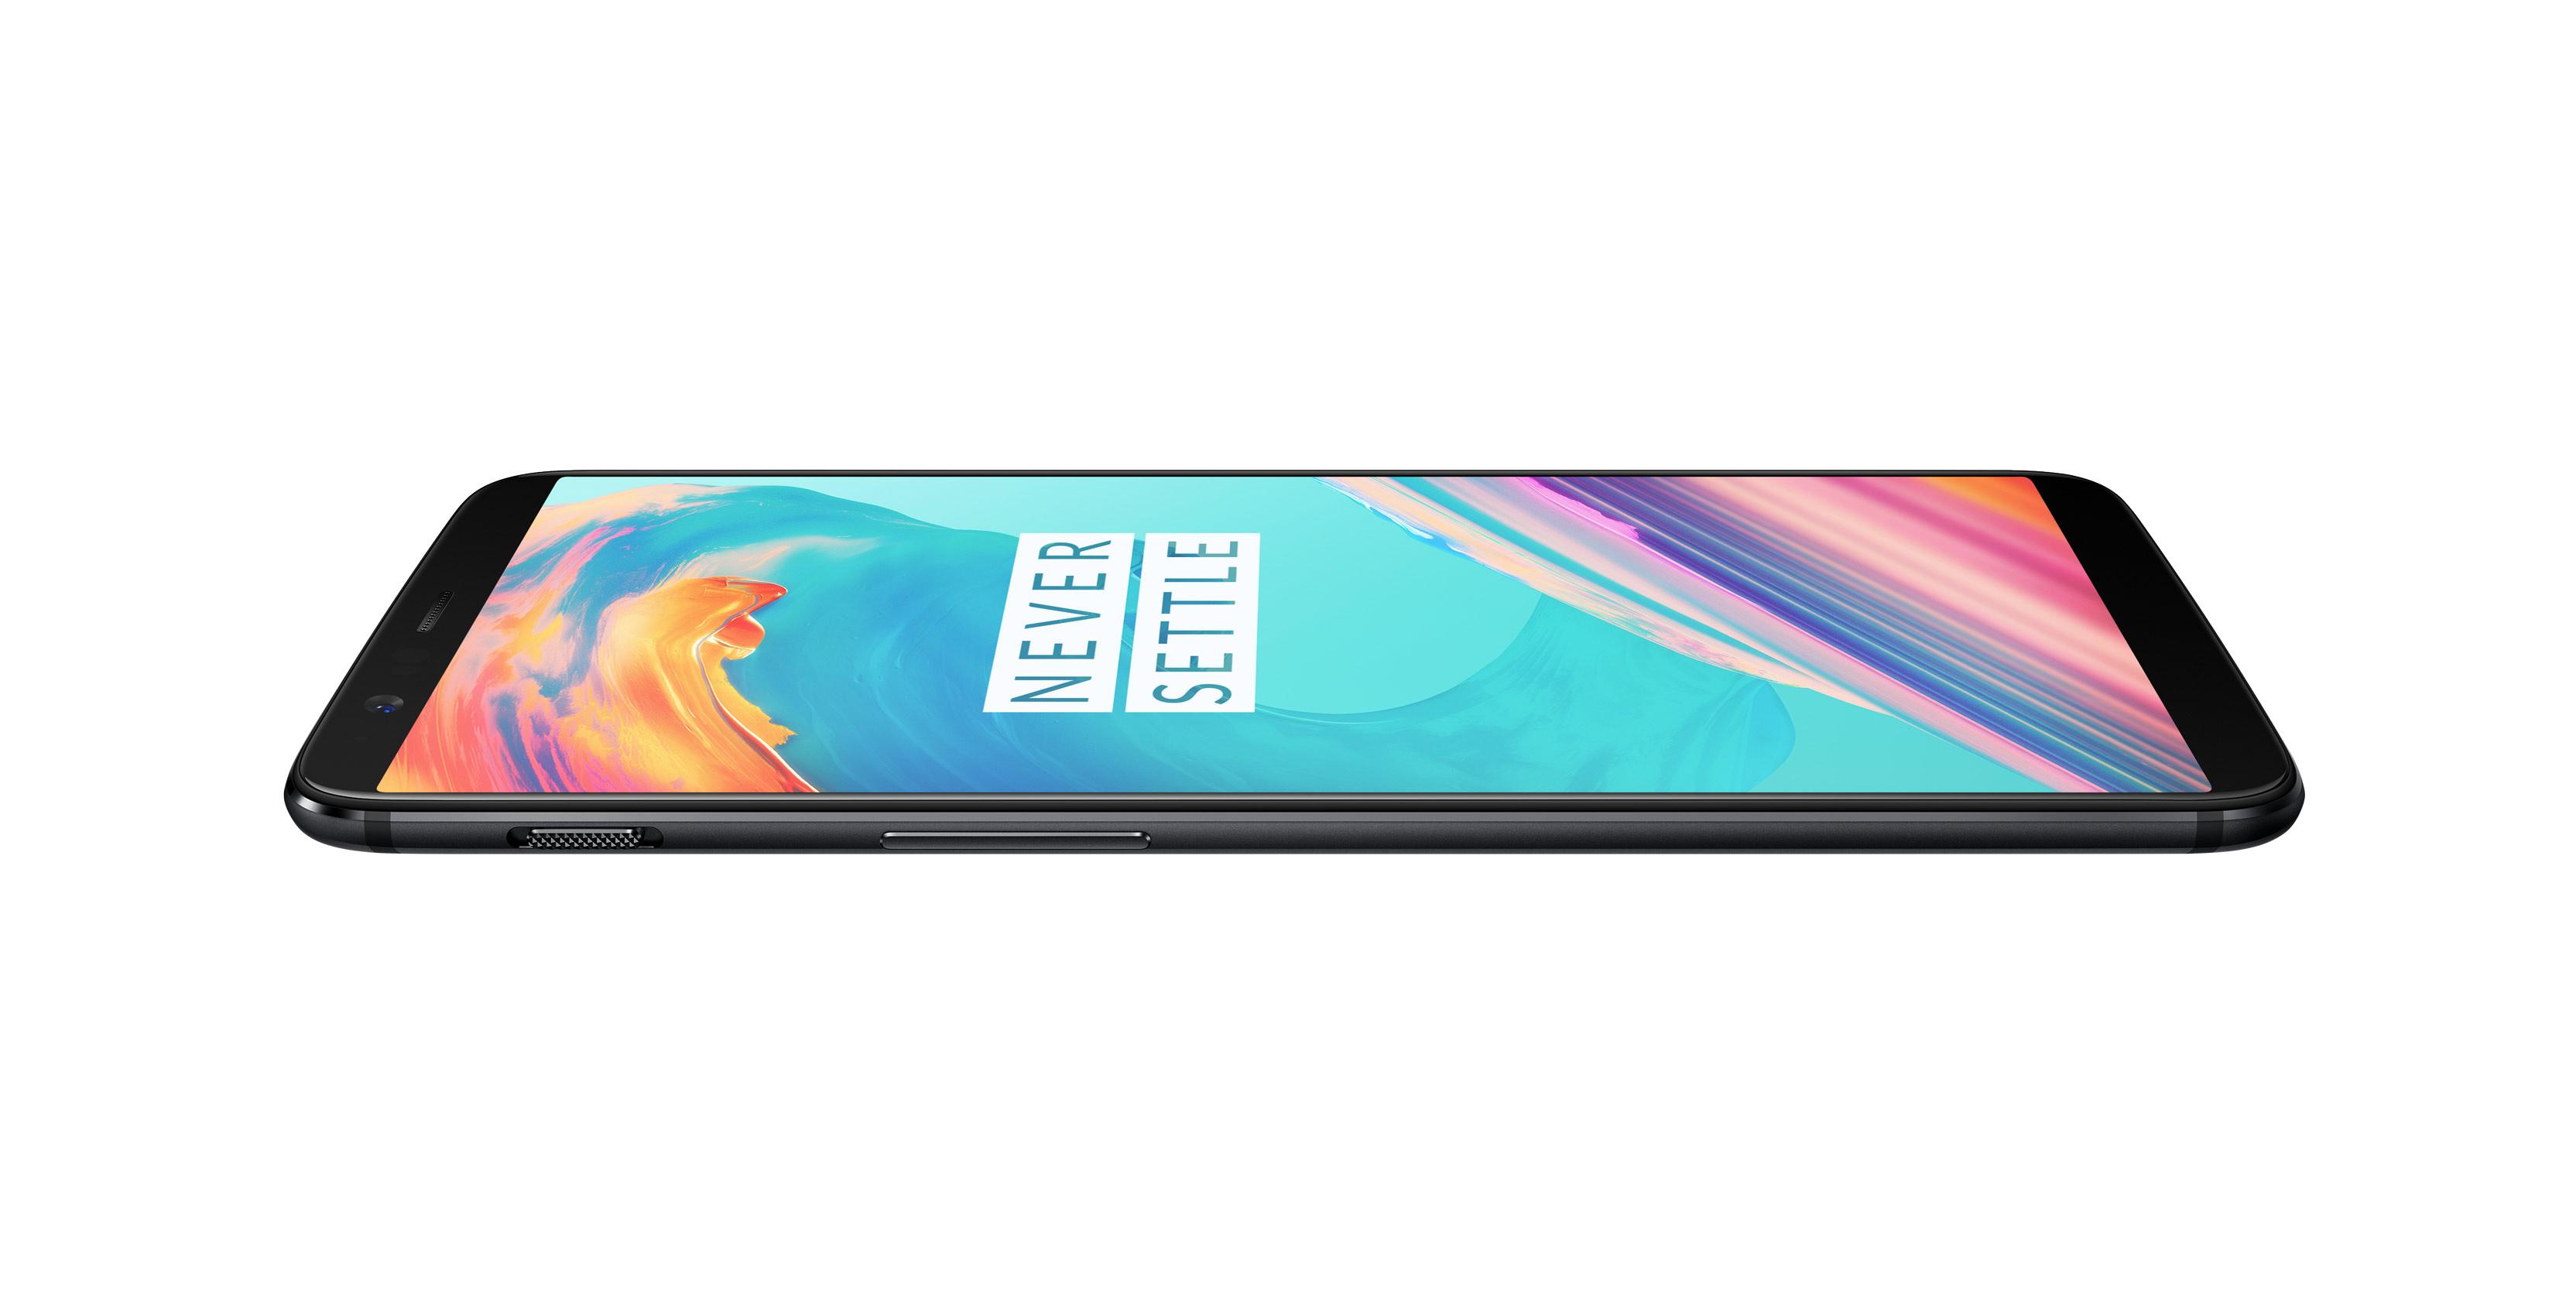 Top of OnePlus 5T smartphone